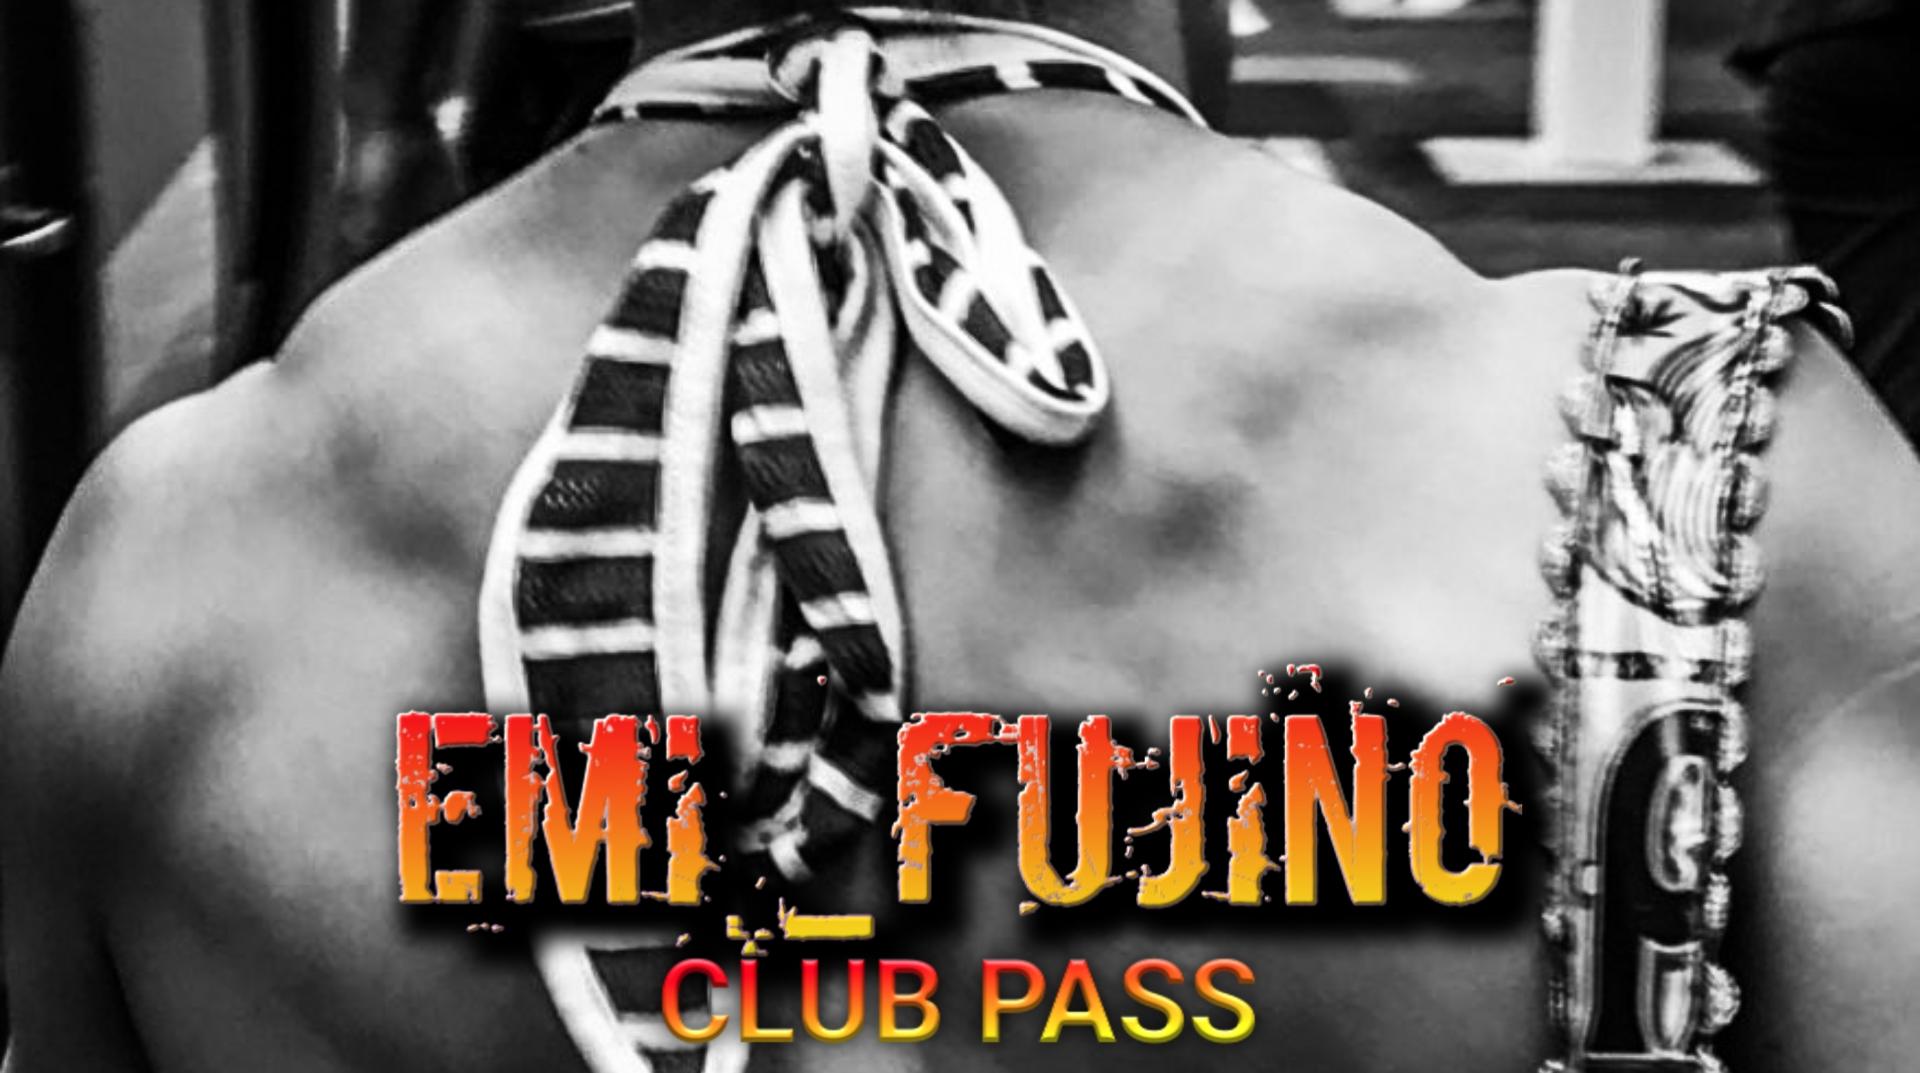 Emi_fujino Club Pass